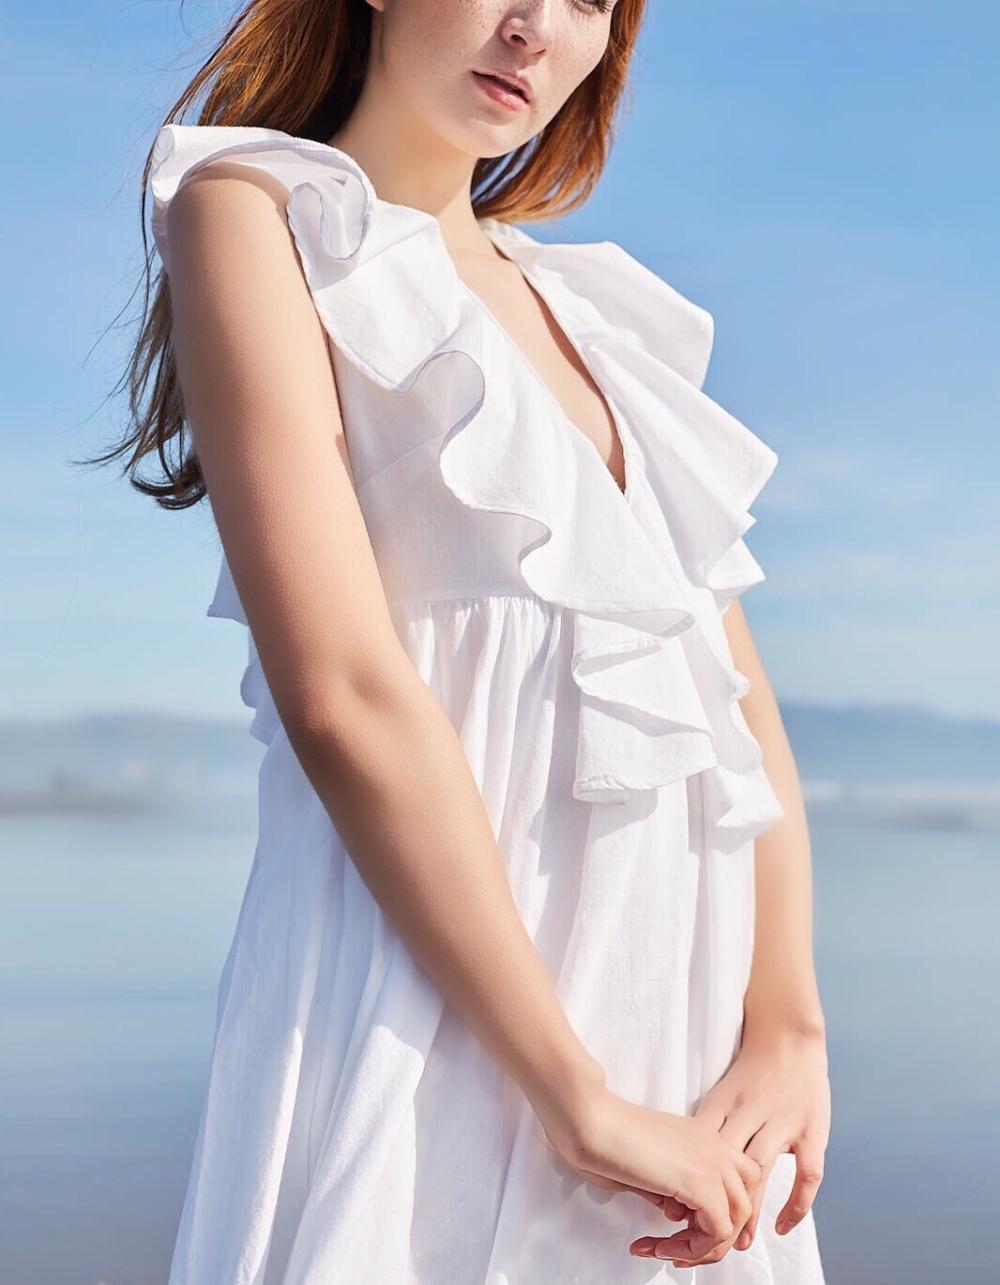 Alyssa_Nicole_Lula_Dress_1B159B0D